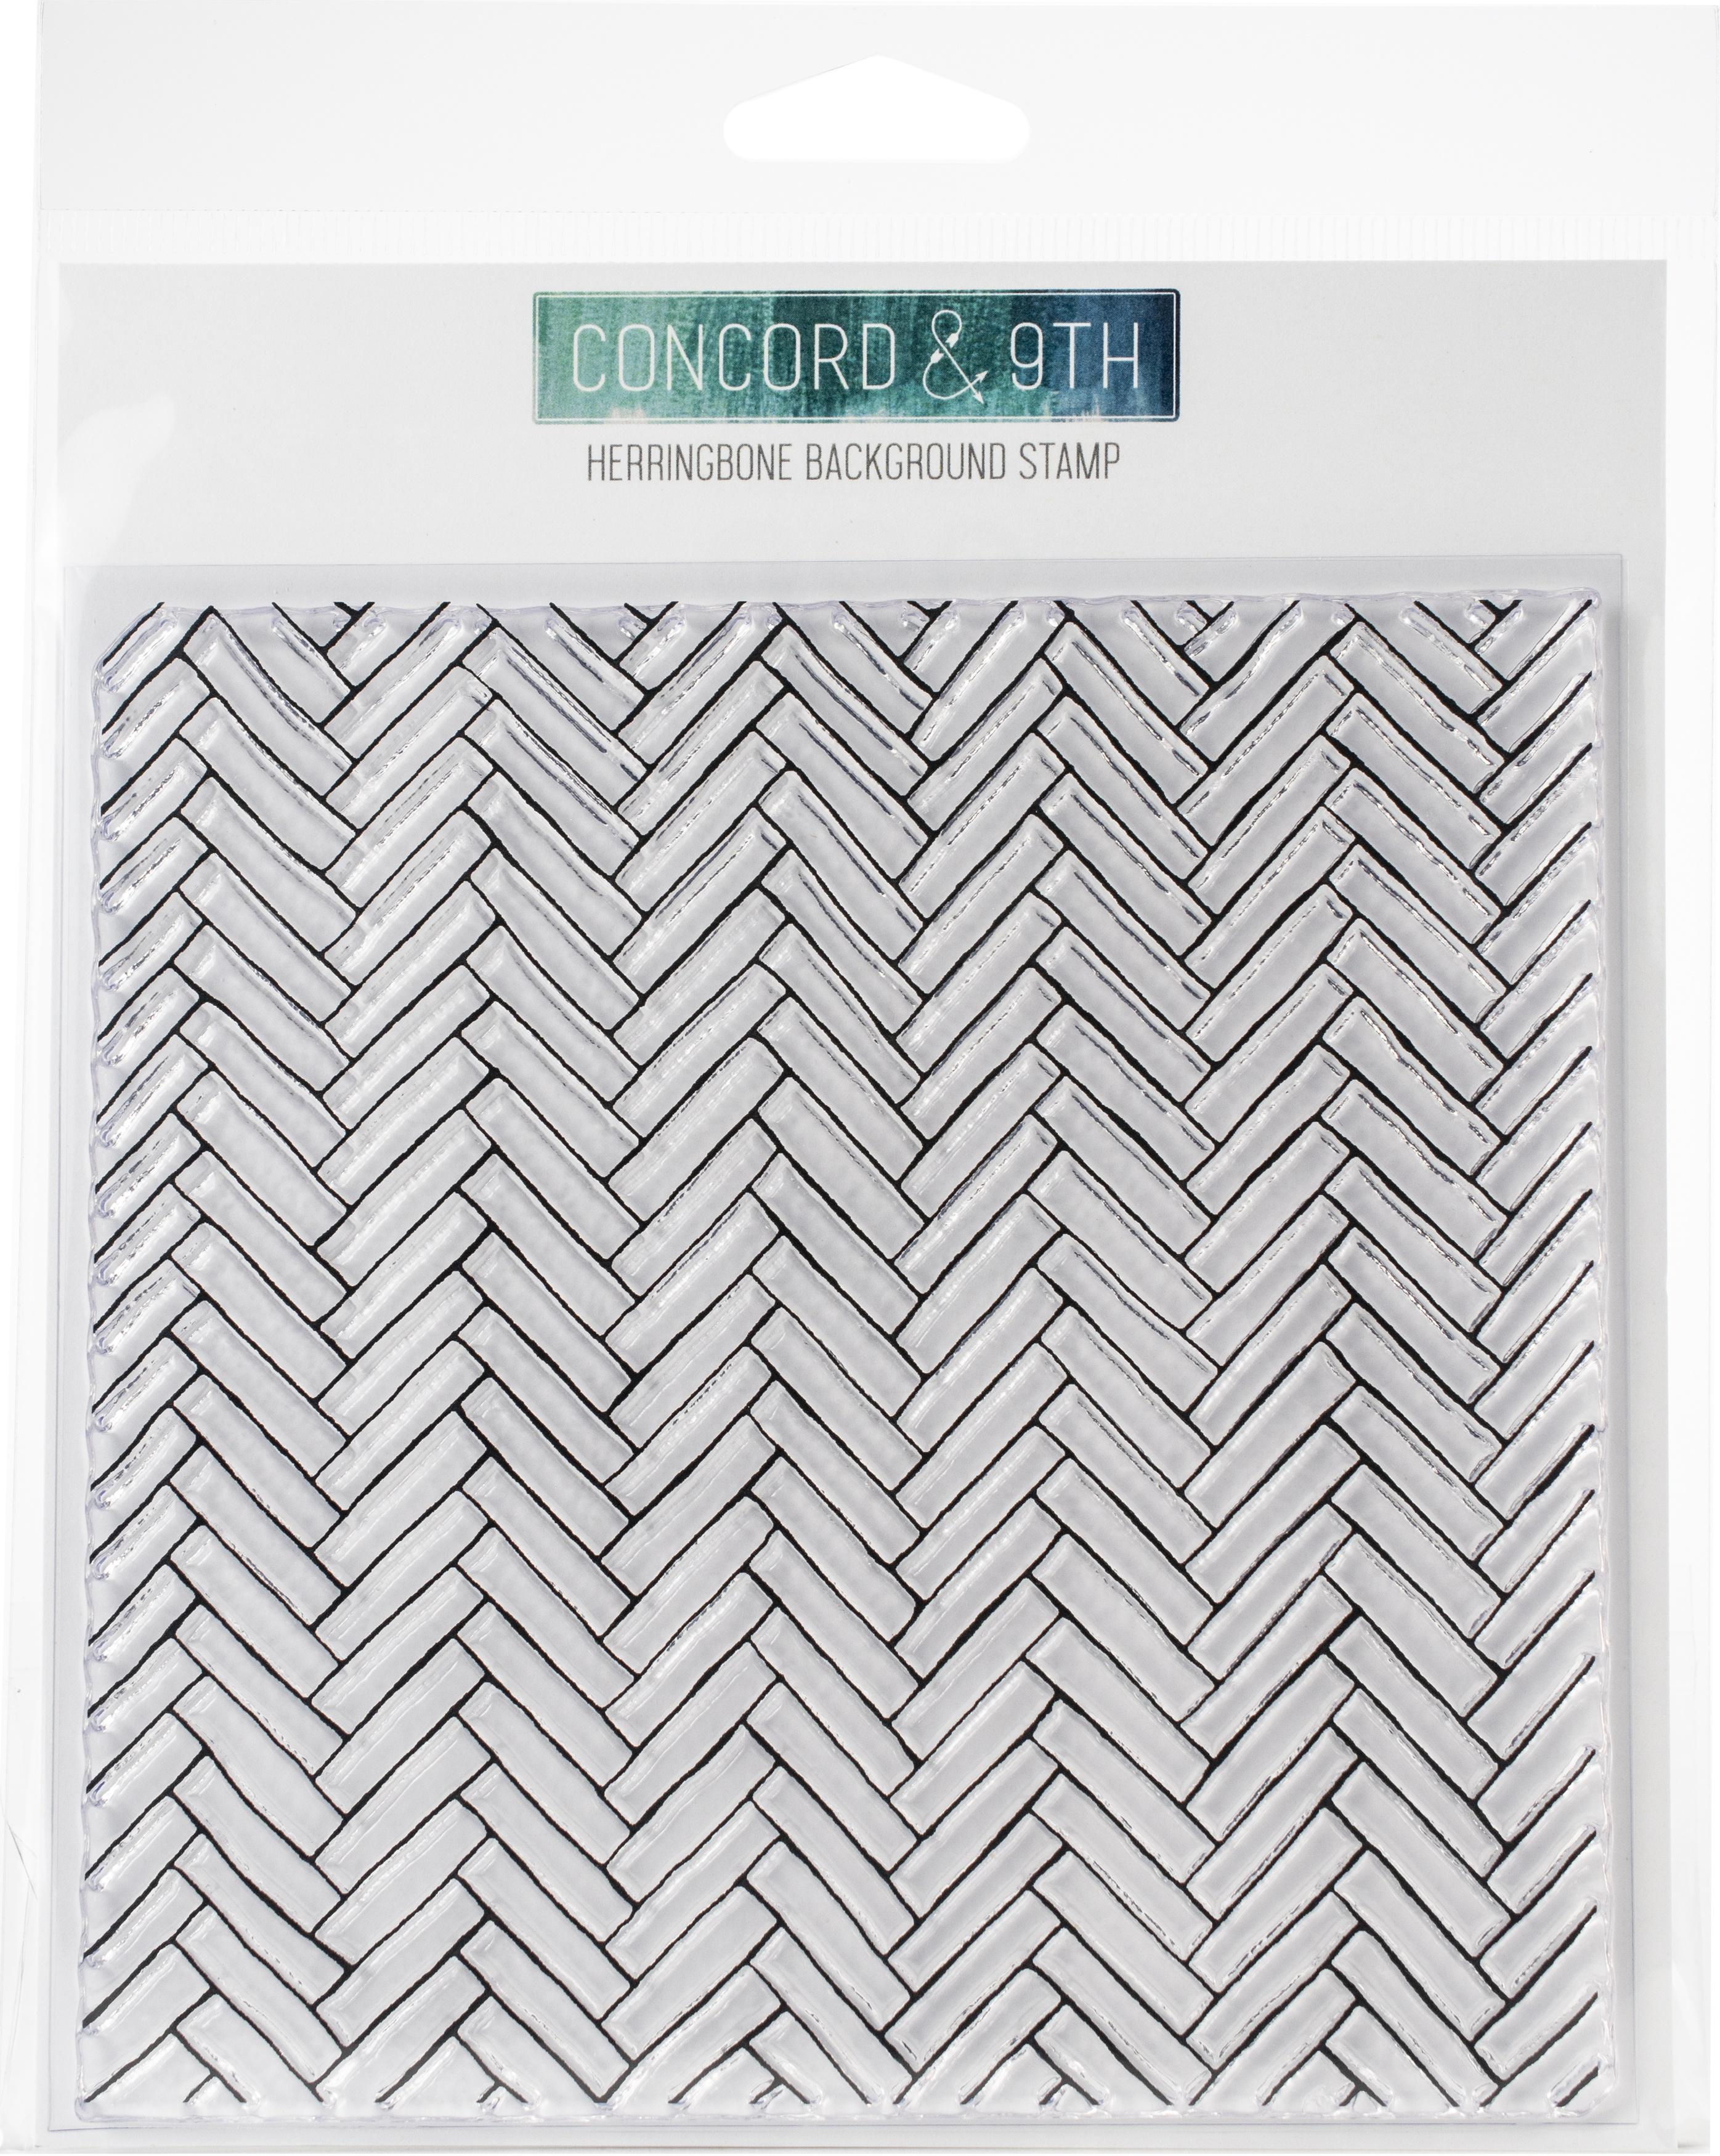 Concord & 9th Herringbone Background Stamp